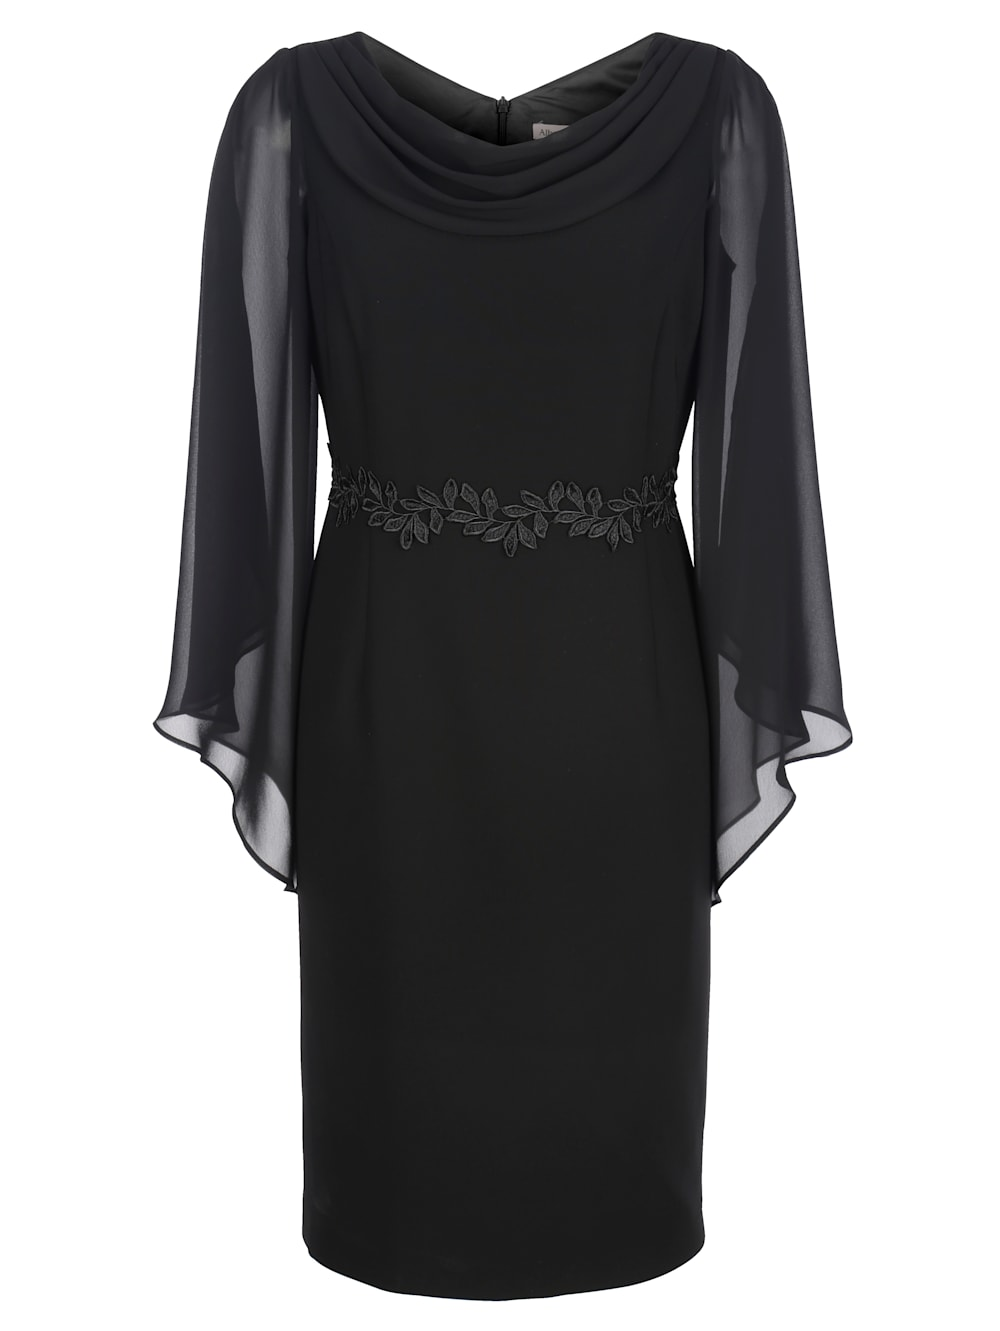 alba moda kleid mit chiffon-Ärmeln | alba moda